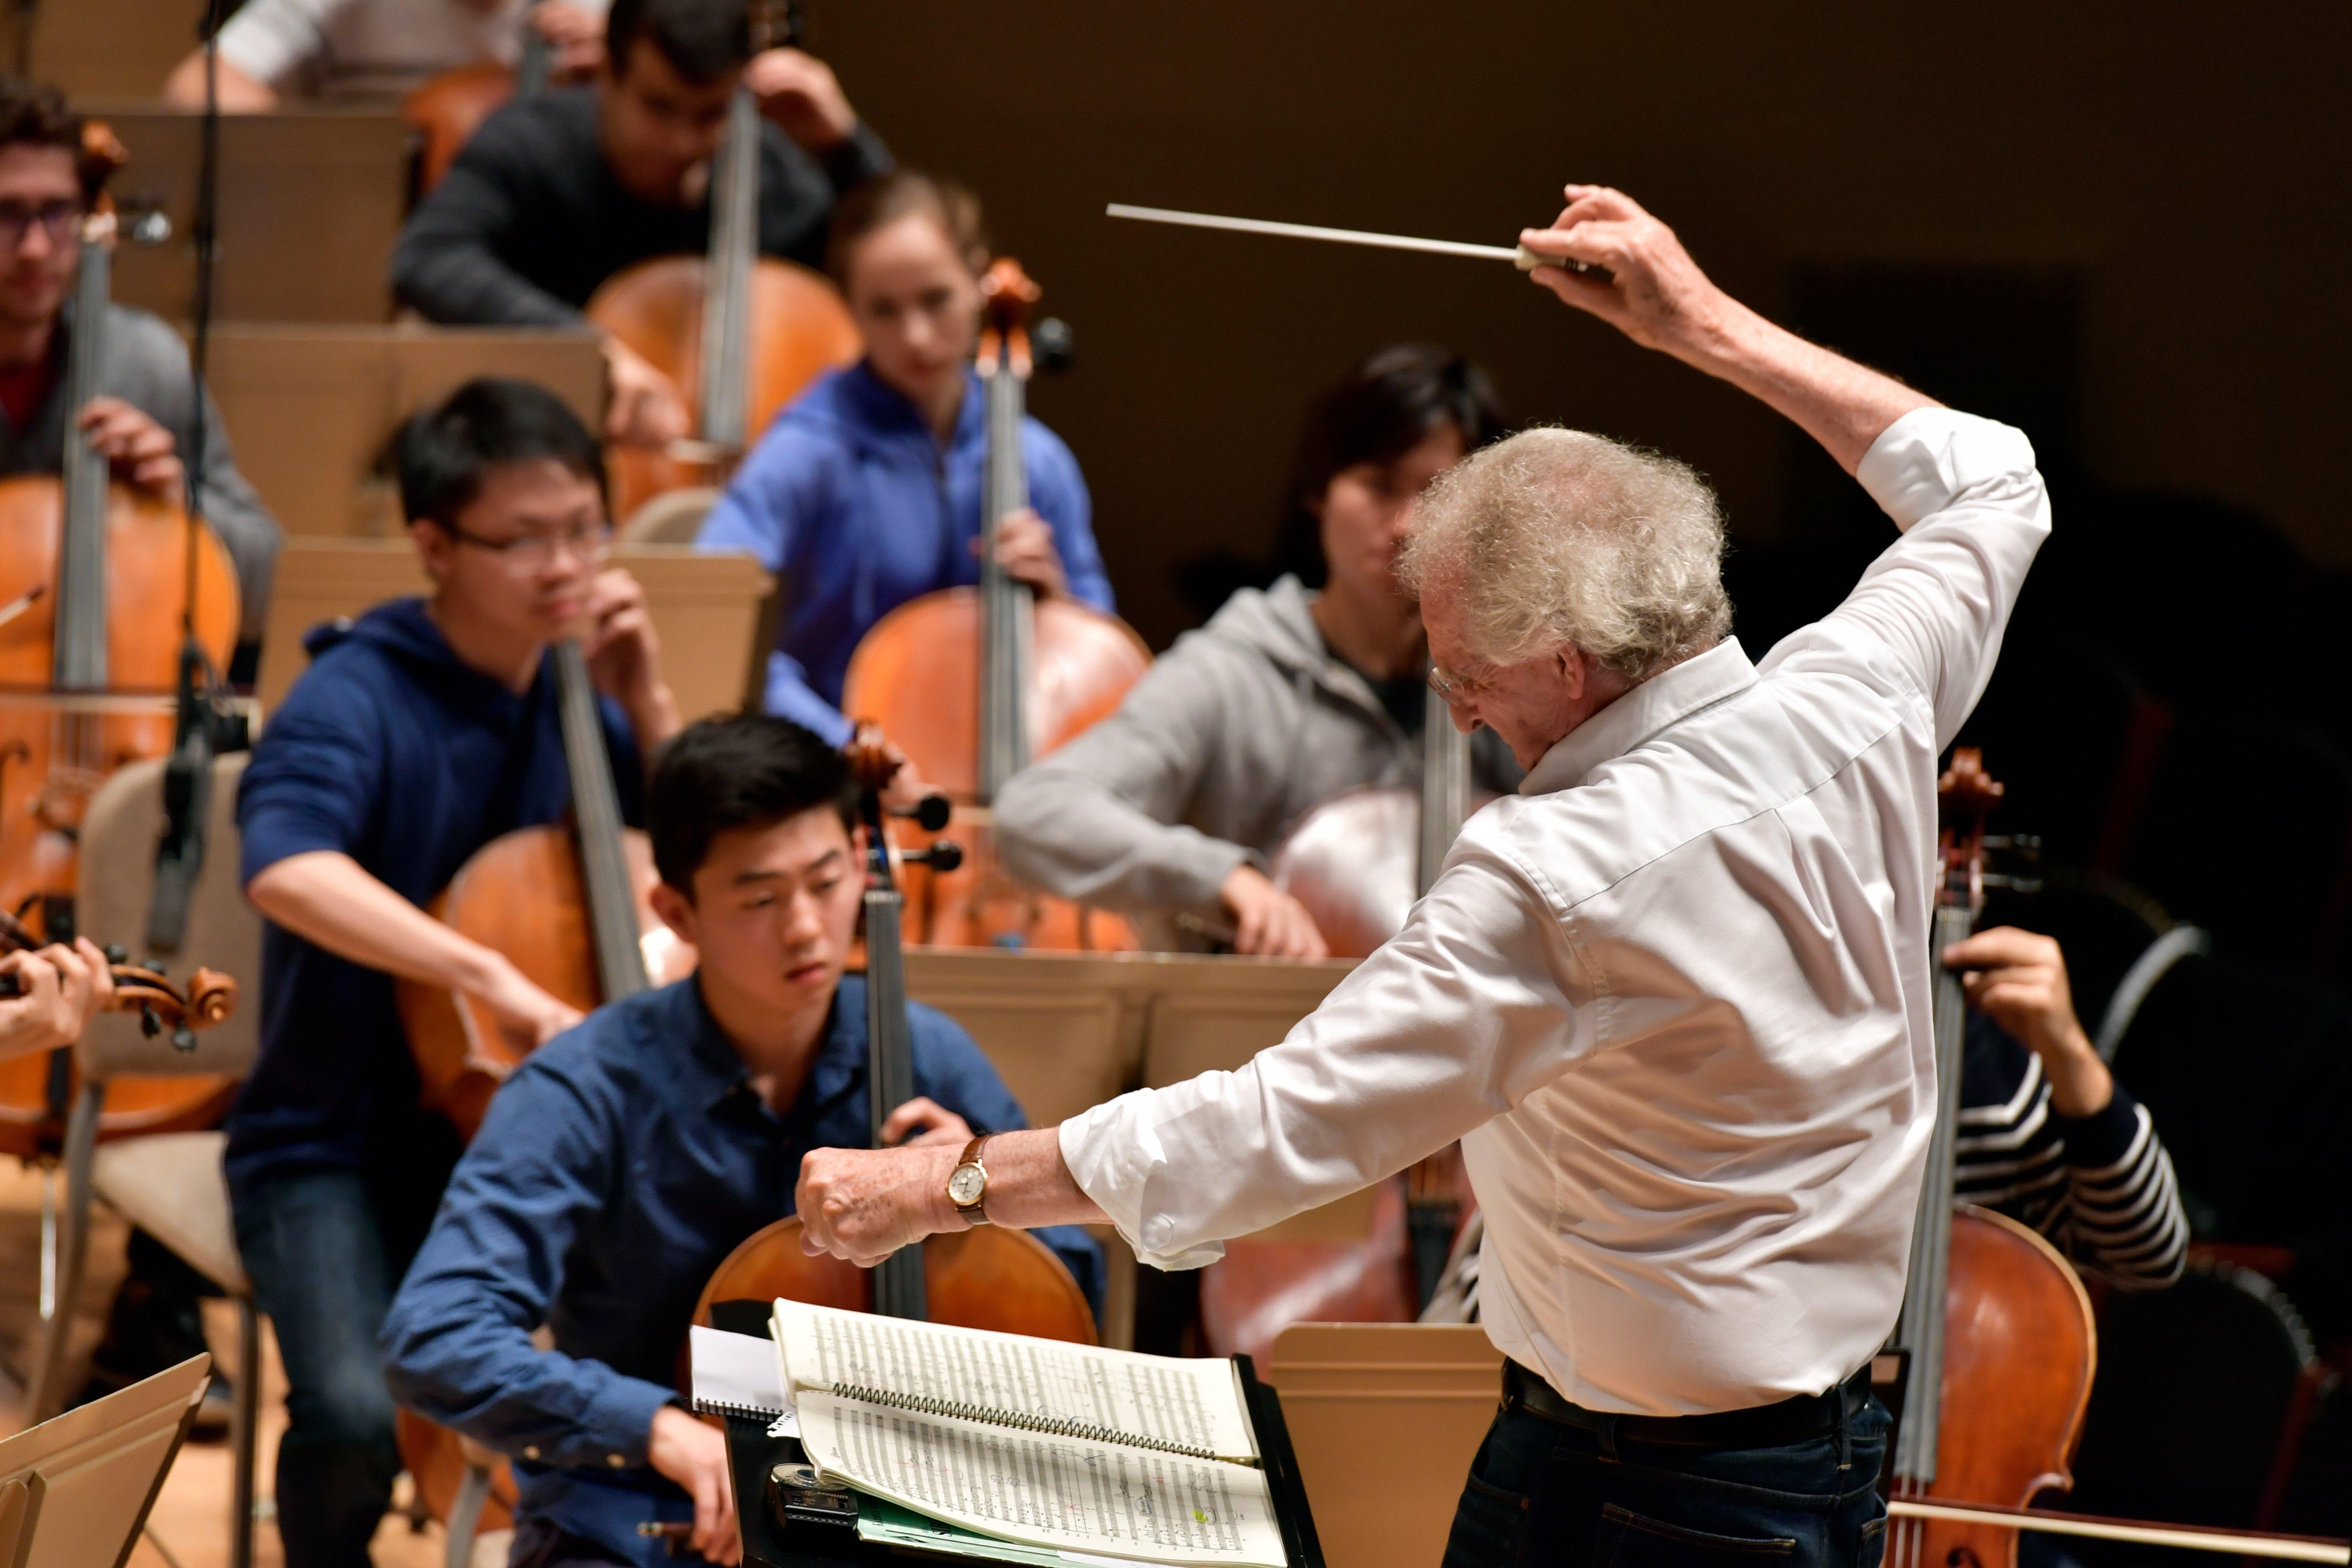 Zander Conducting BPYO